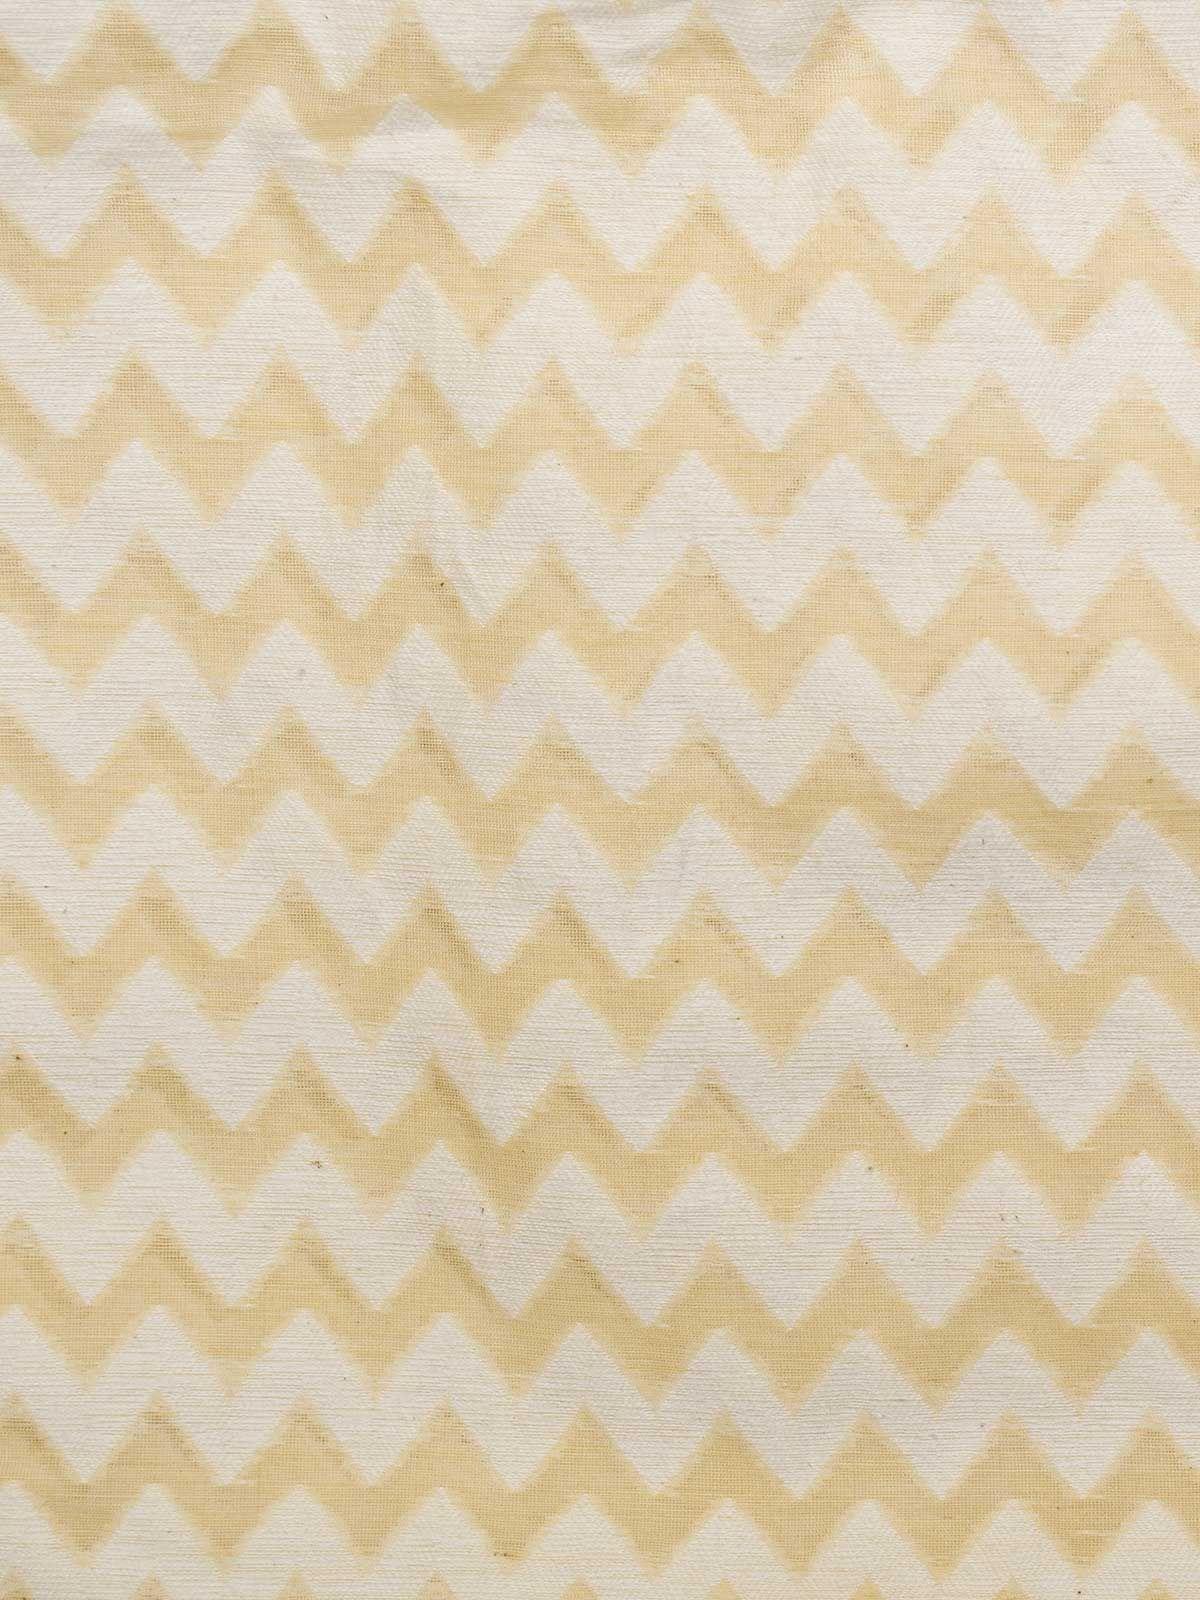 White and Yellow Jamdani Cotton Fabric